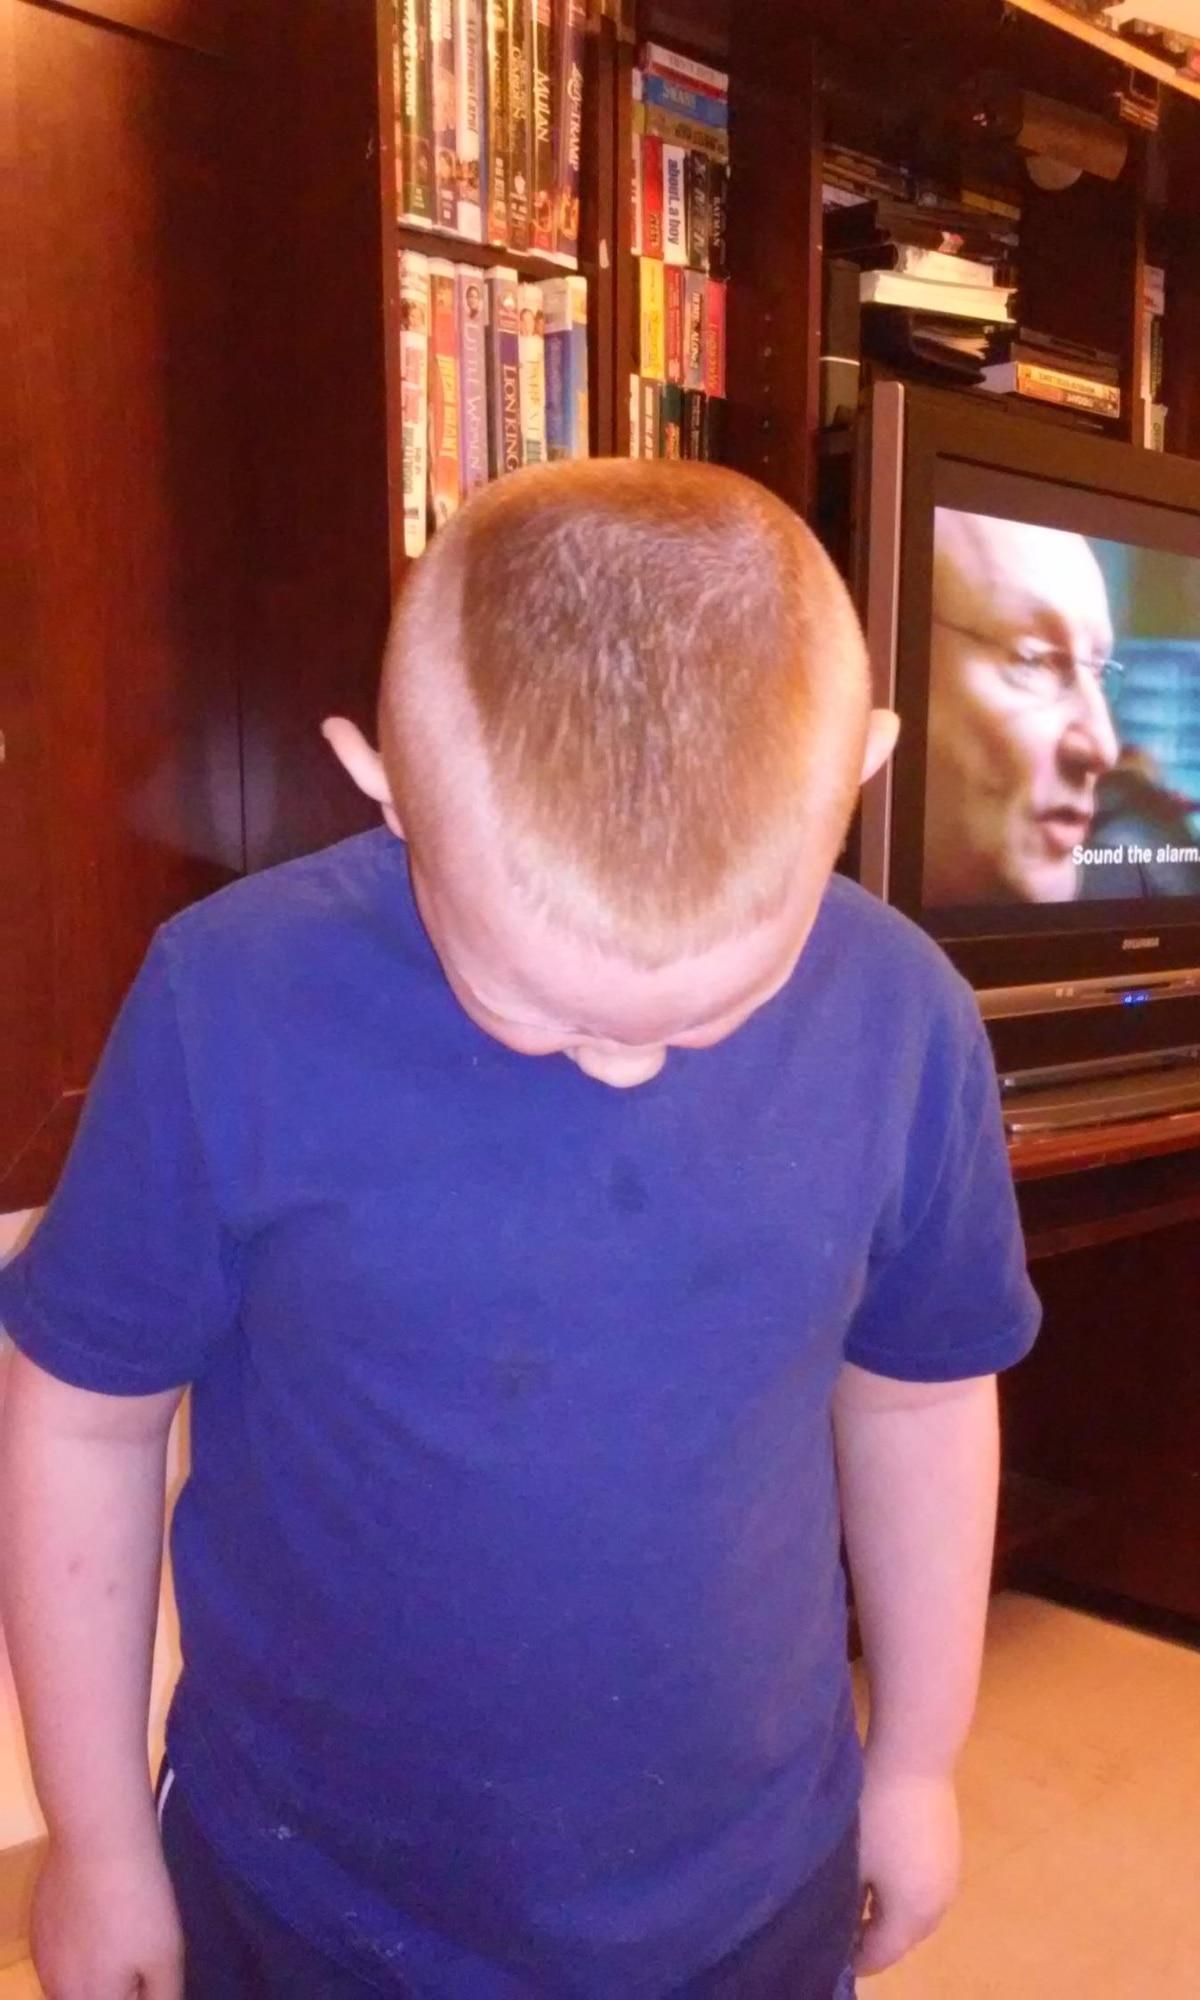 Suspension Threat Outcry Over Boys Military Haircut